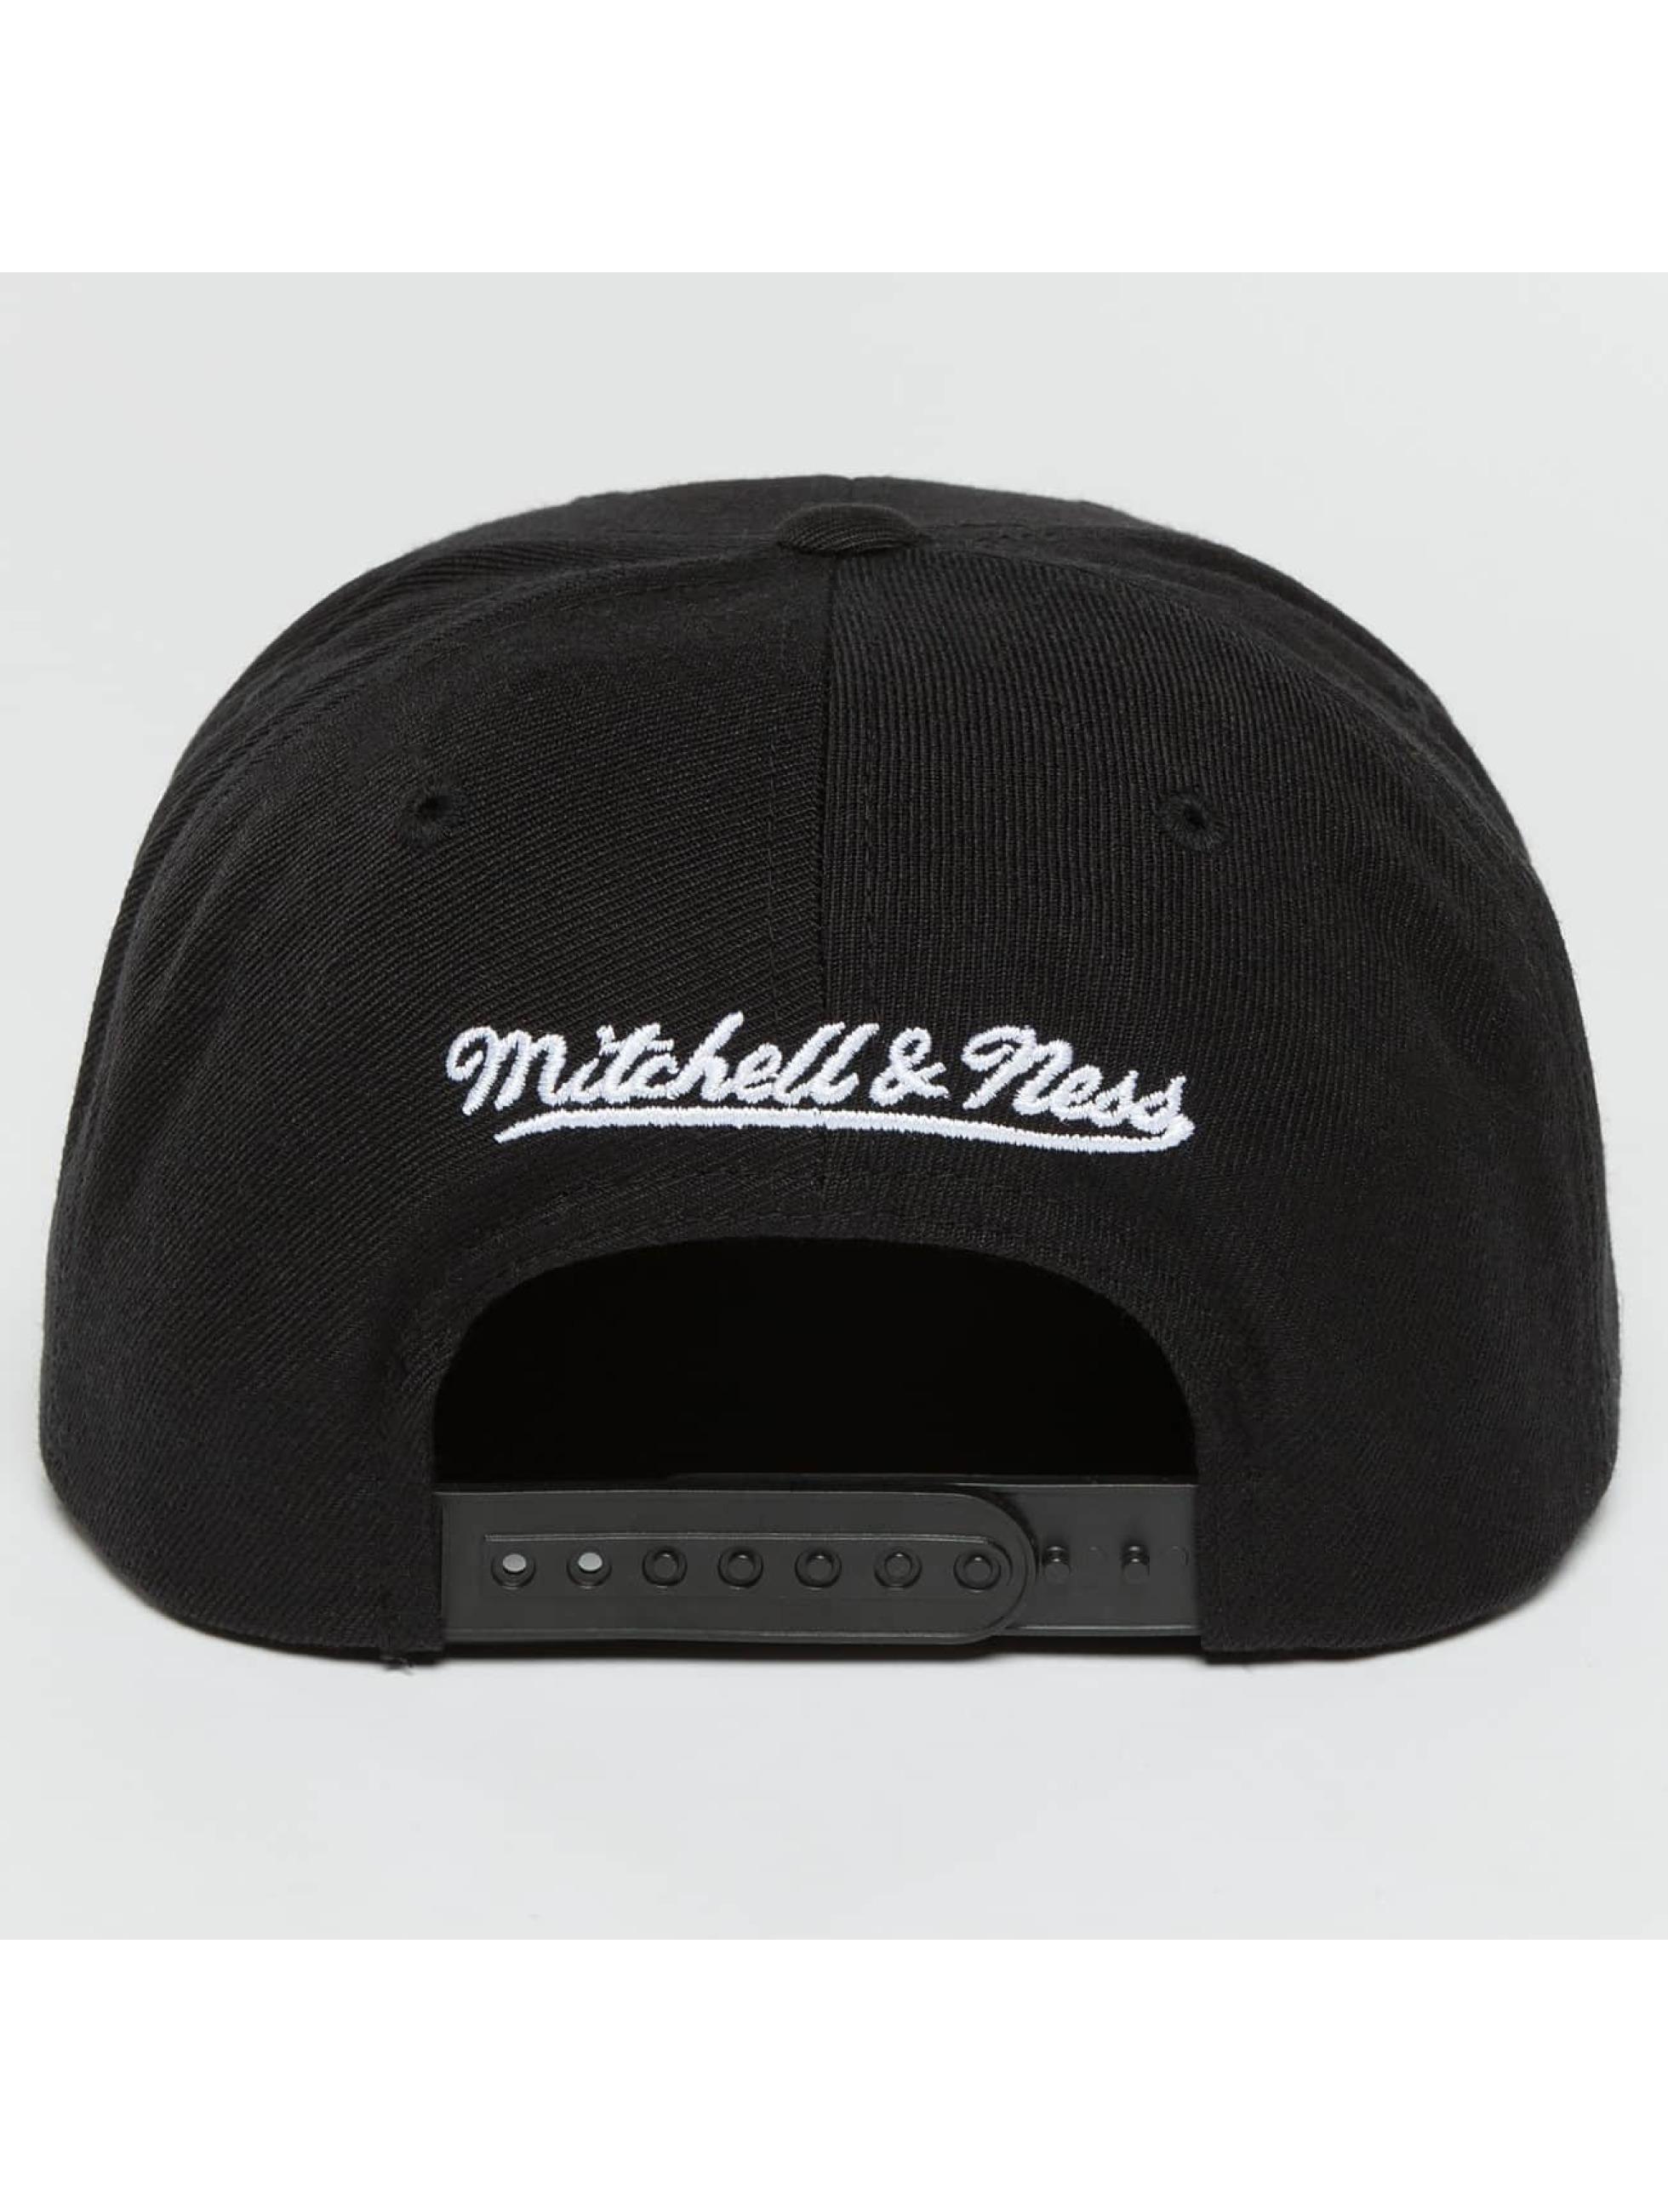 Mitchell & Ness Кепка с застёжкой Full Dollar Own Brand черный